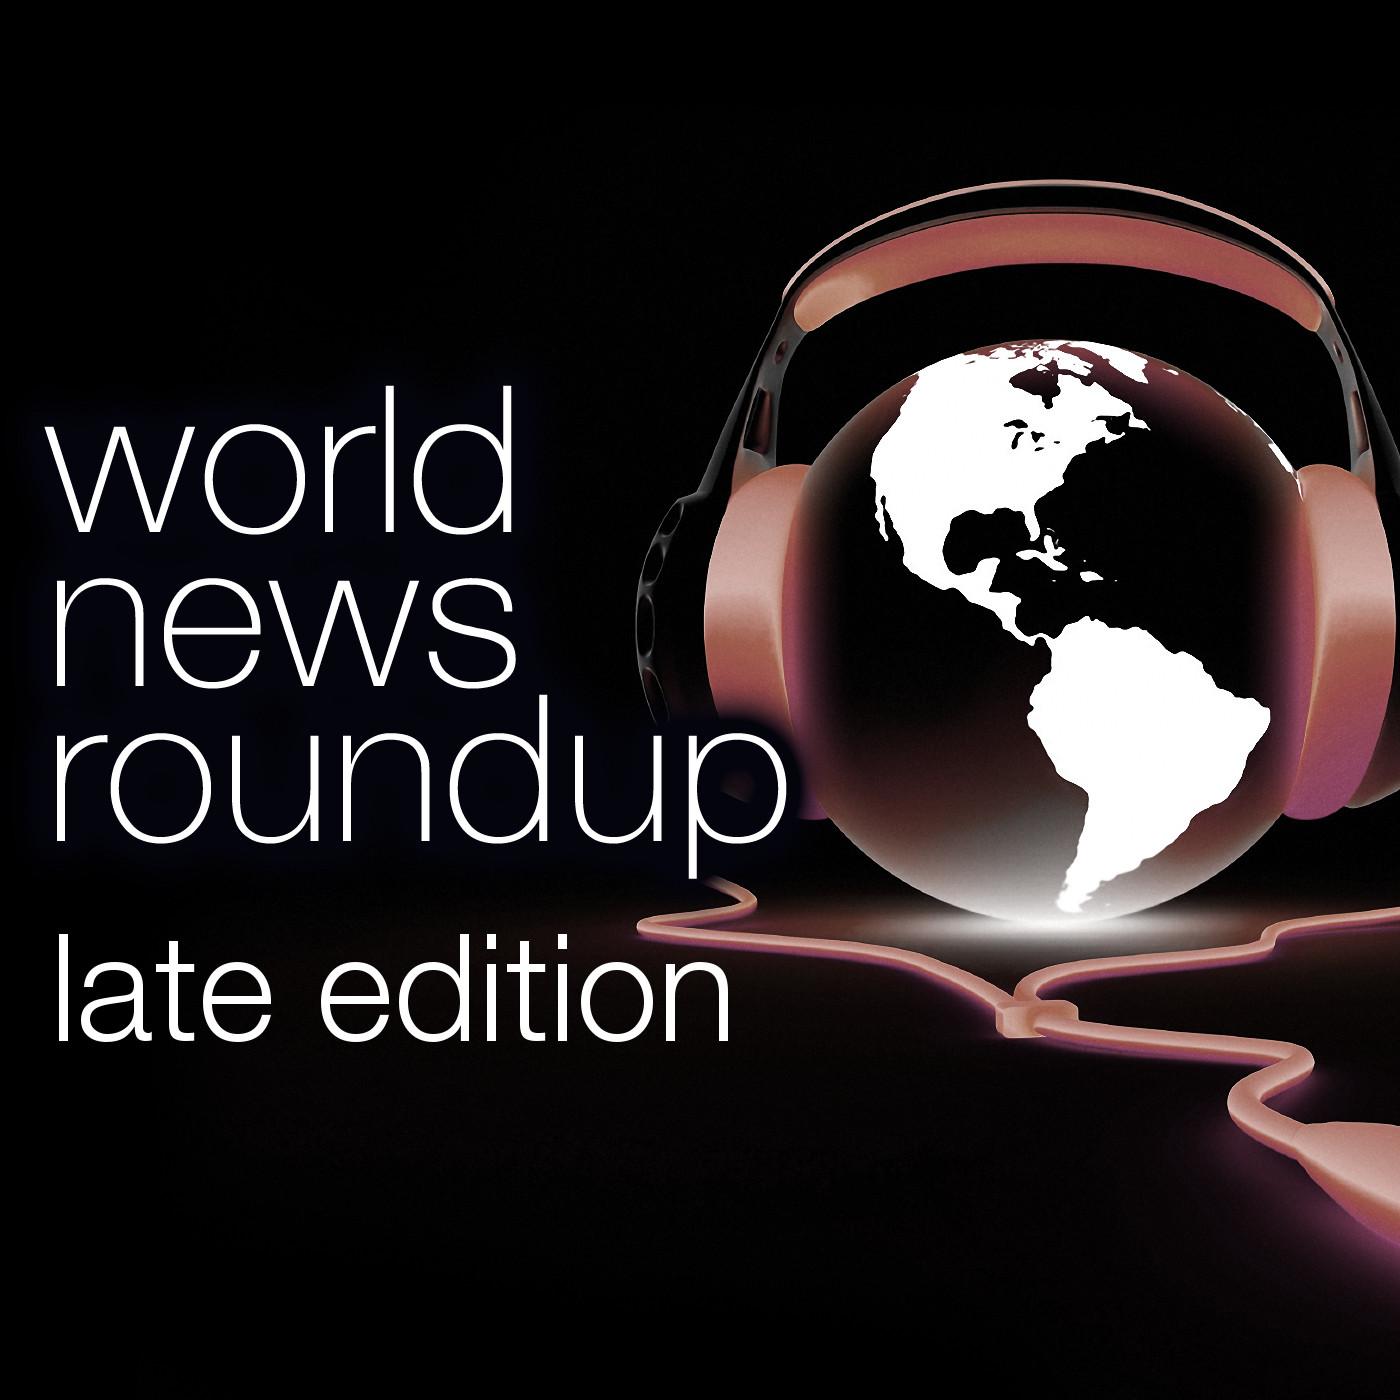 WORLD NEWS ROUNDUP LATE EDITION, 07/31